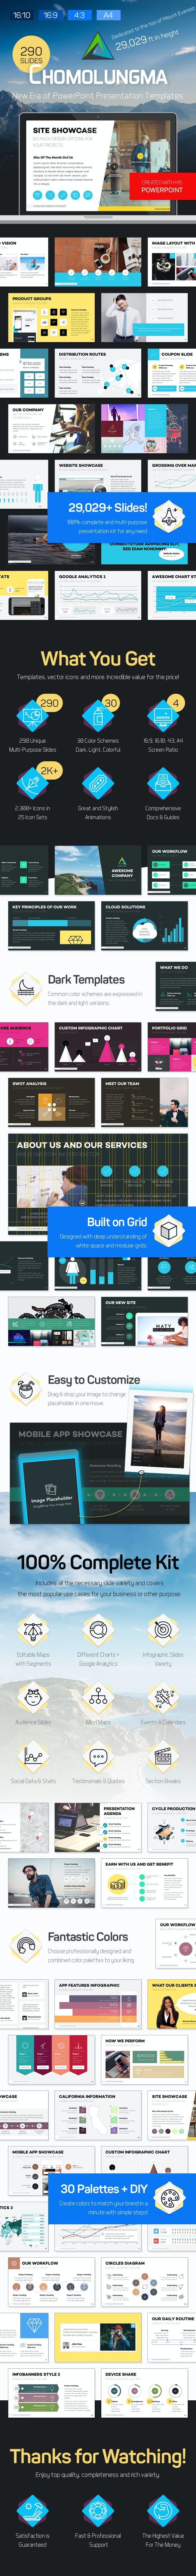 Chomolungma — PowerPoint Presentation Template Kit - Business PowerPoint Templates